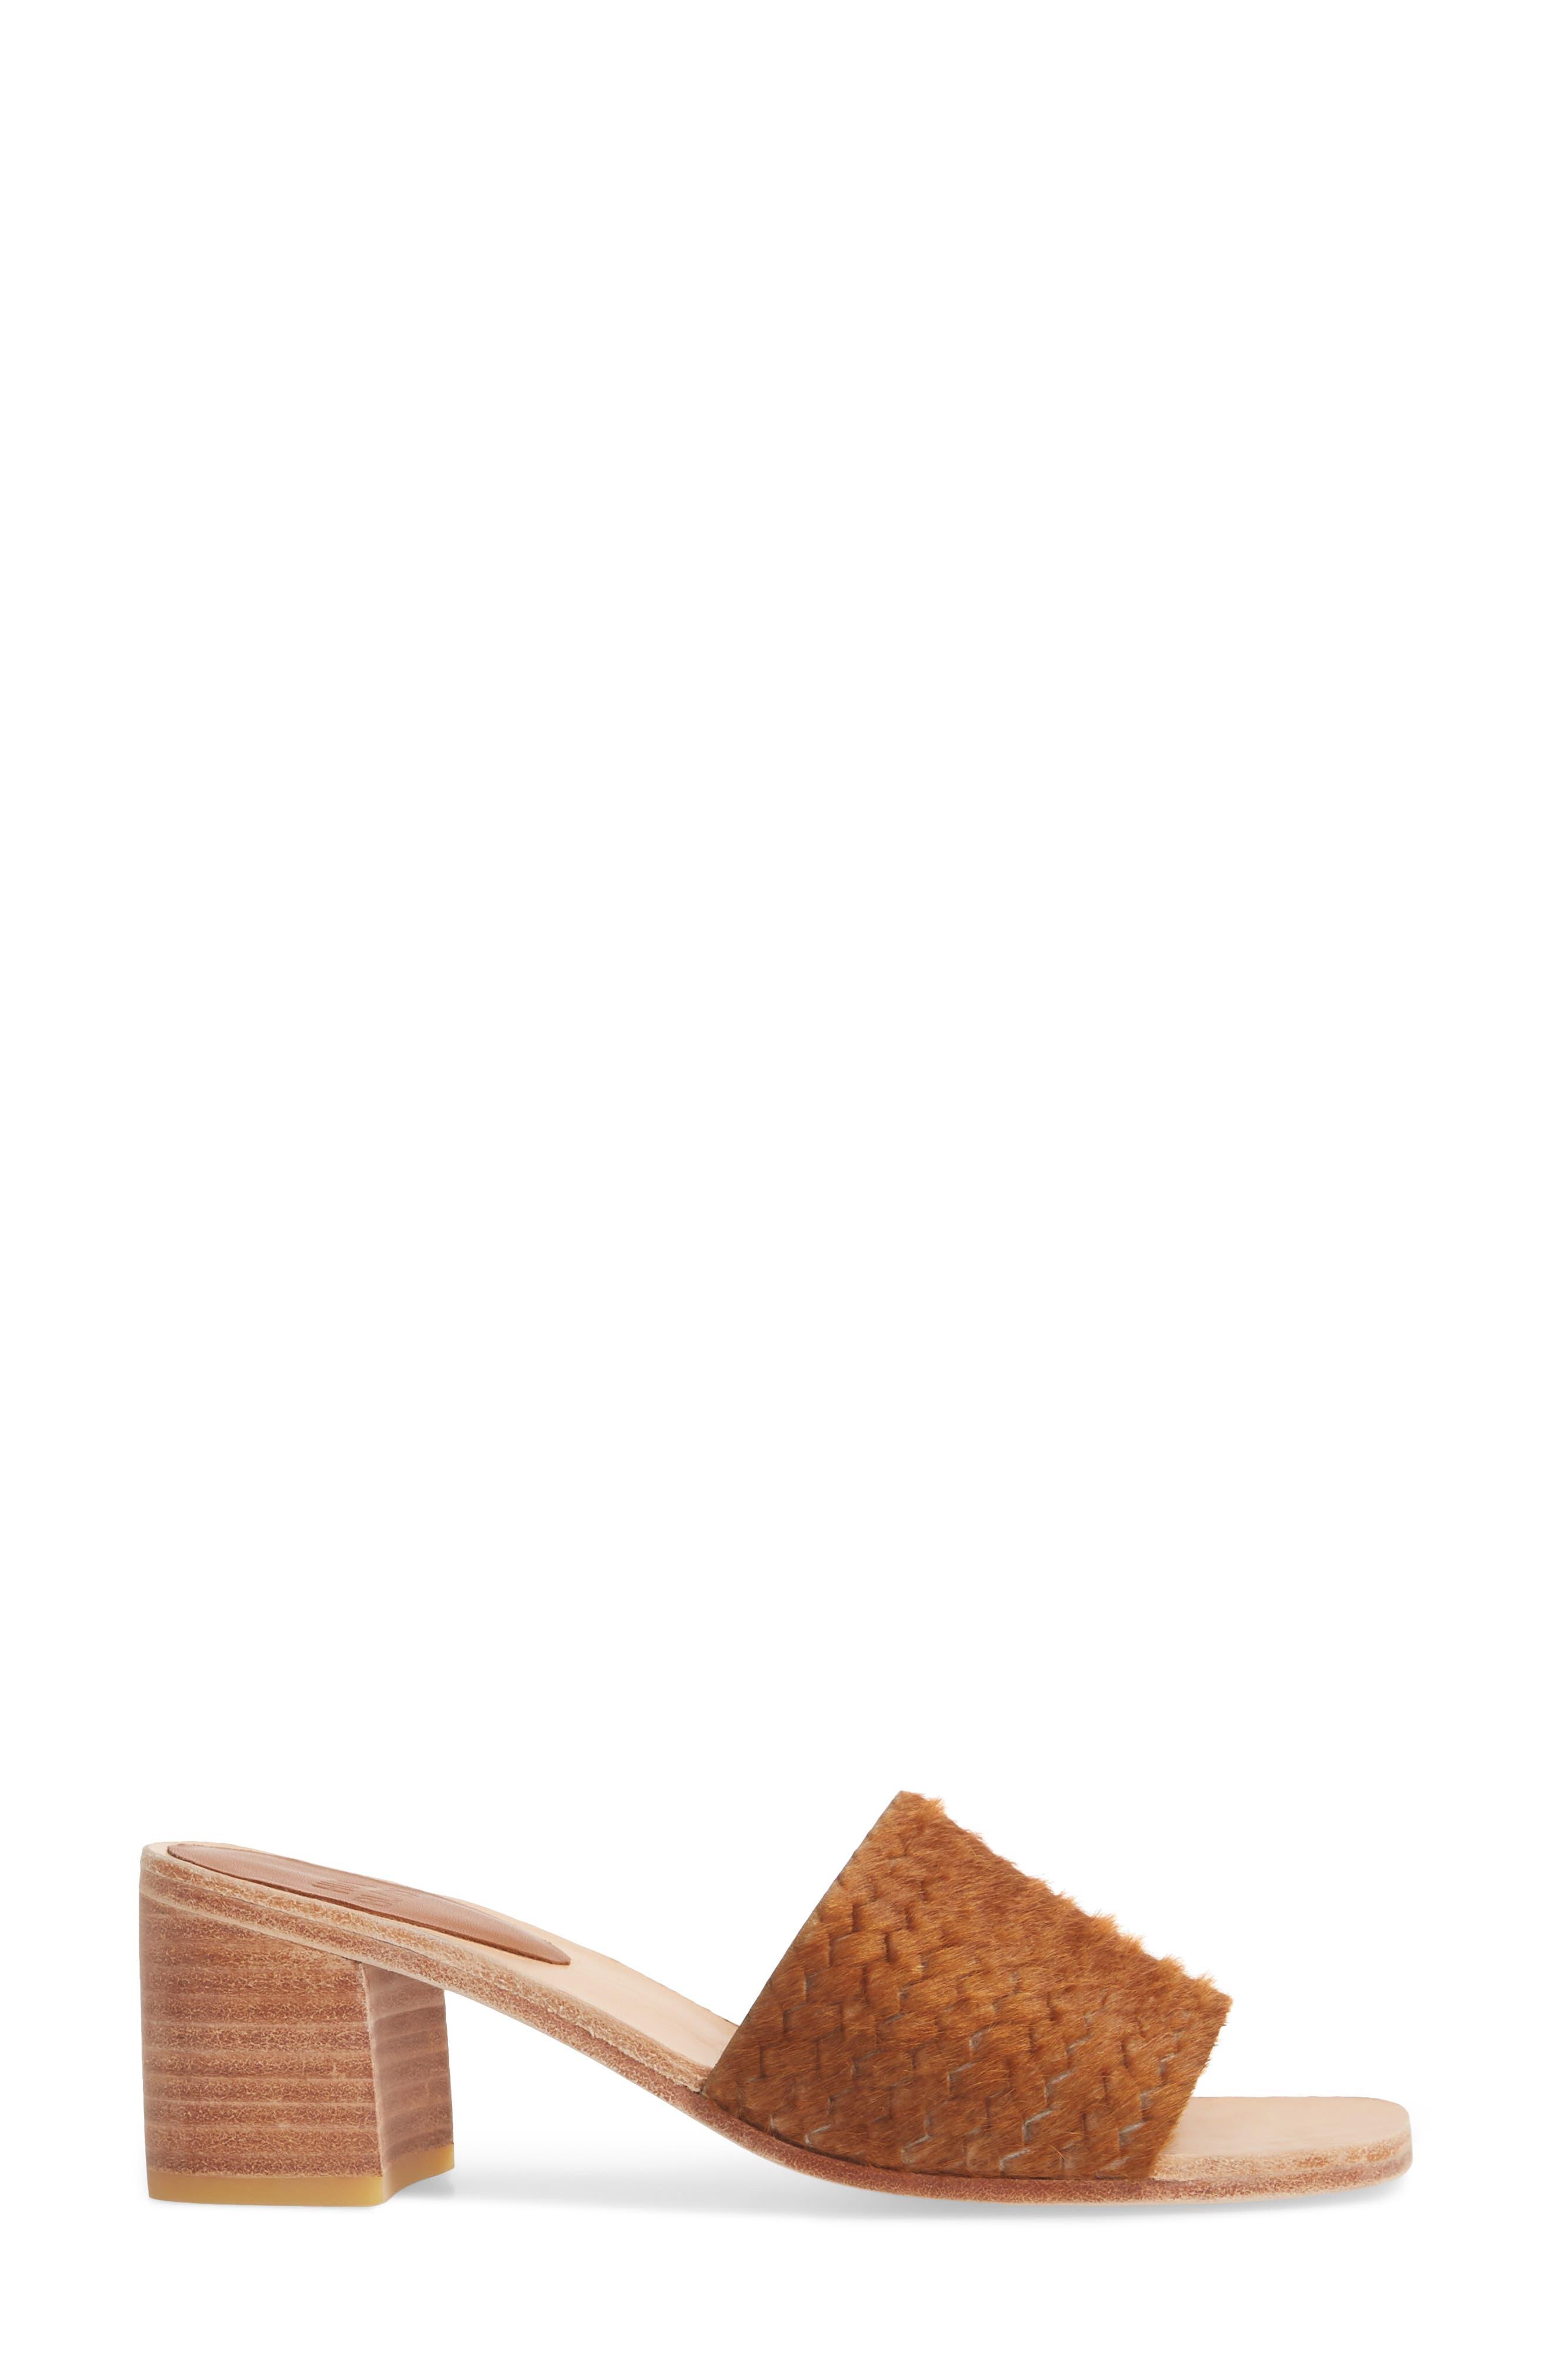 Genuine Calf Hair Sandal,                             Alternate thumbnail 3, color,                             Caramel Braided Calf Hair